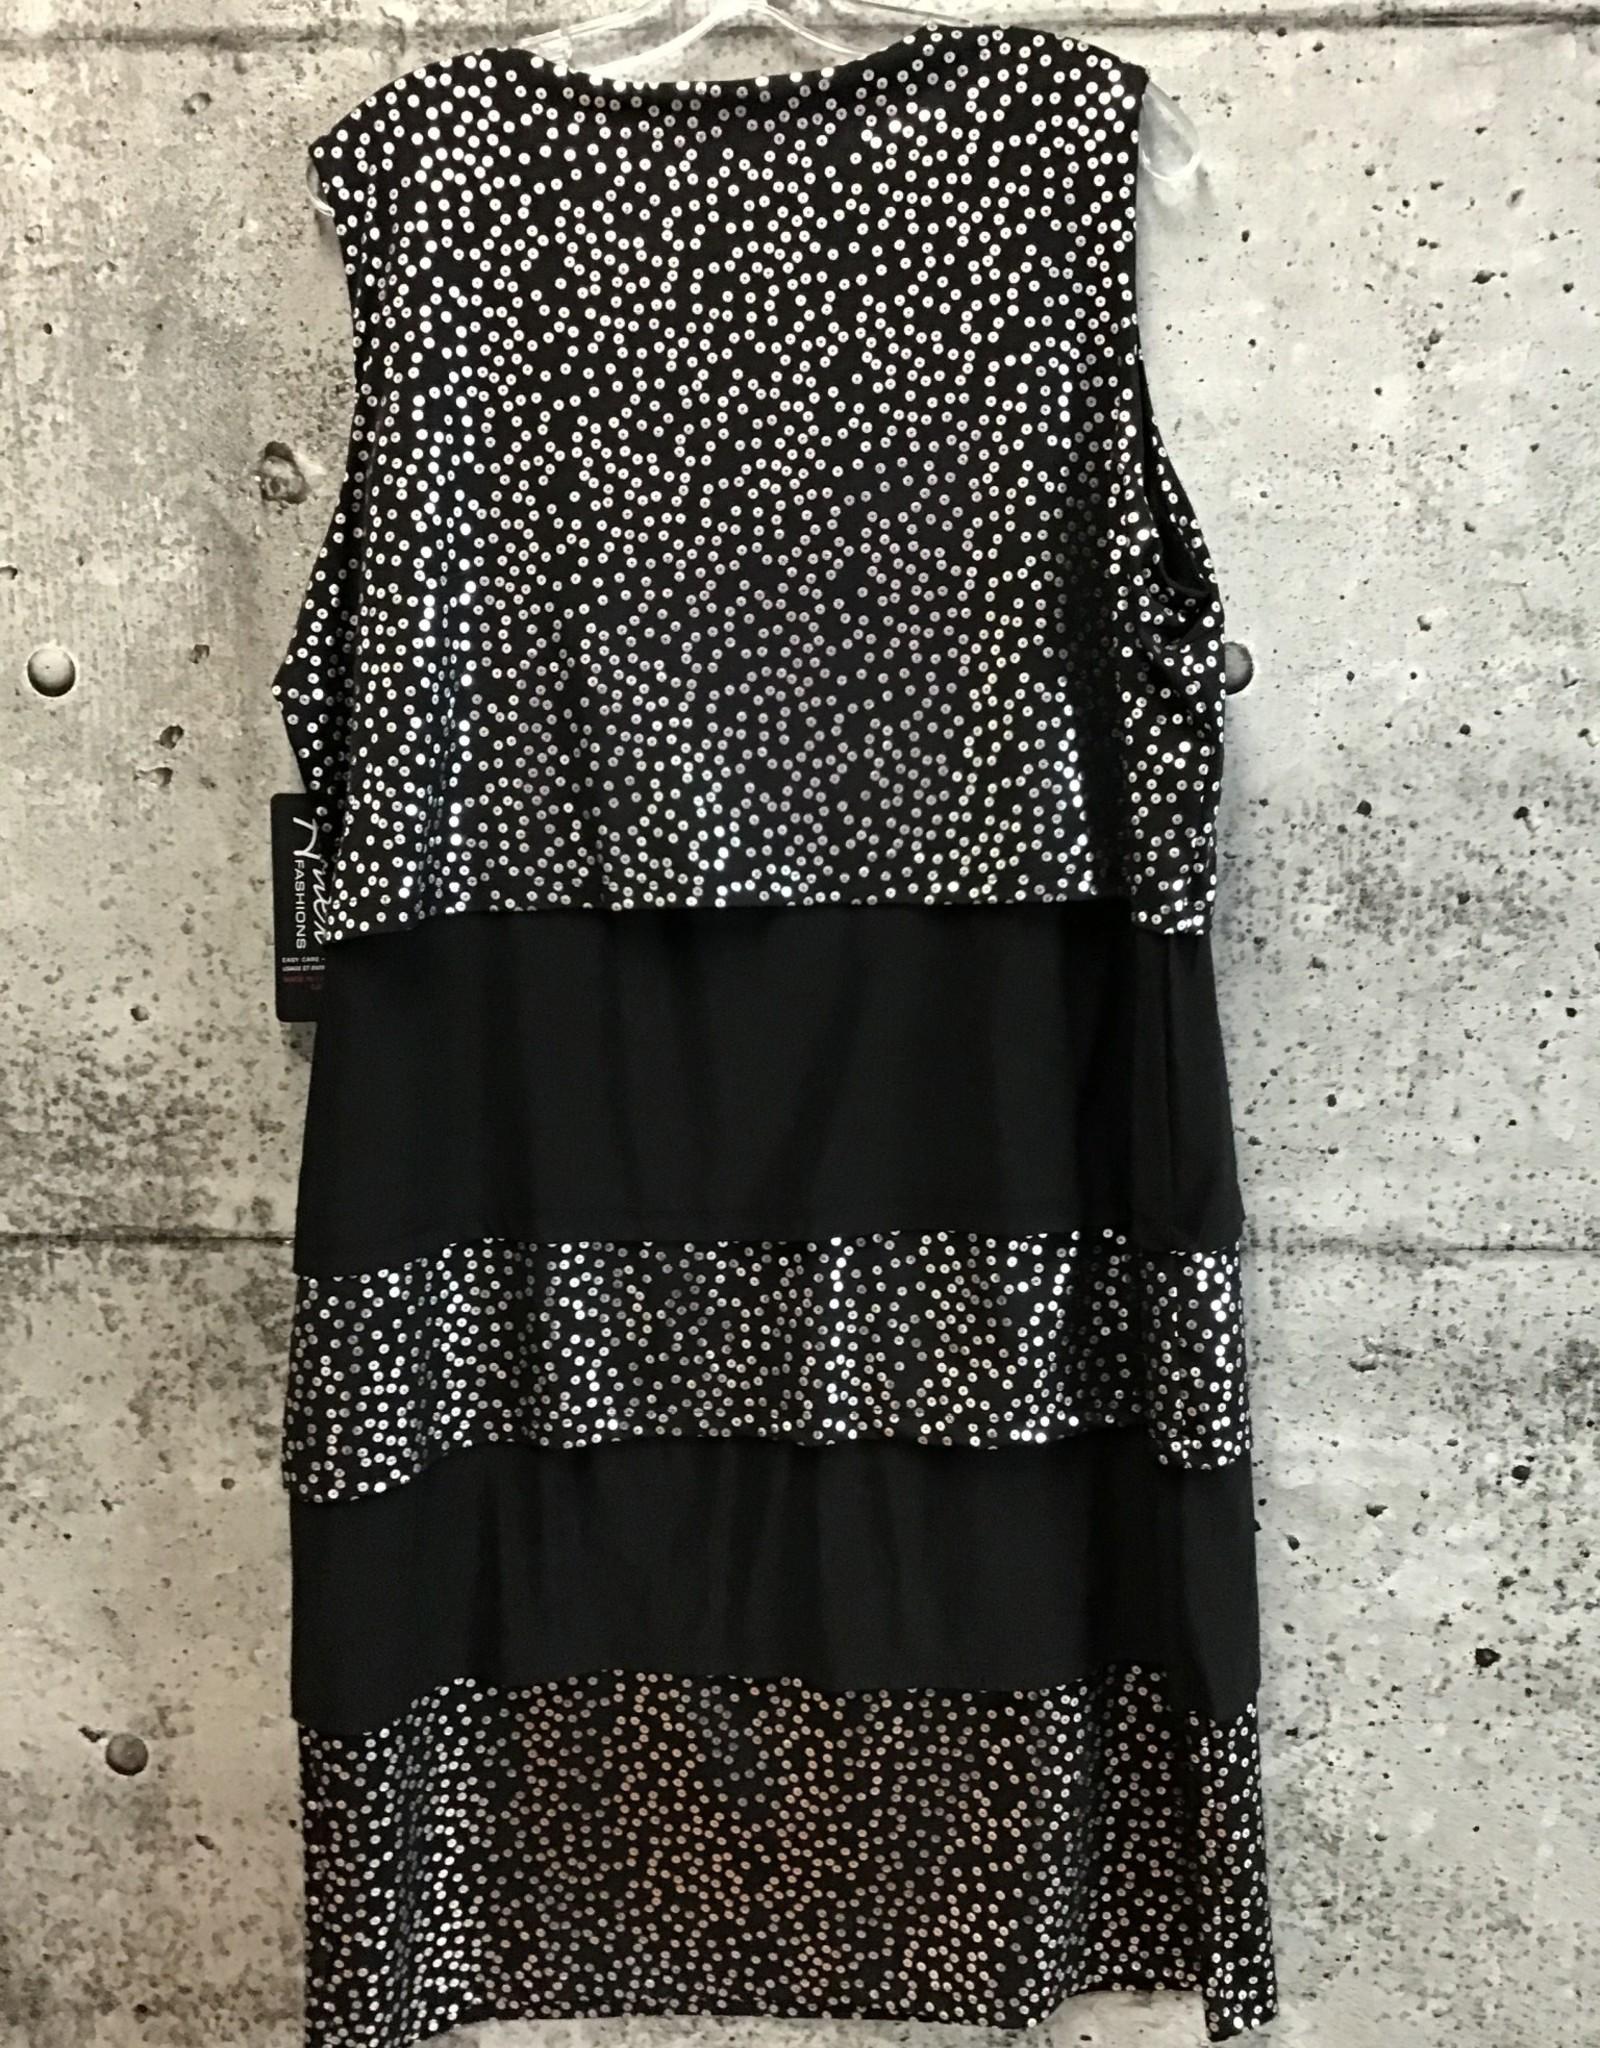 Artex FAUX SEQUIN LAYERED DRESS 6052